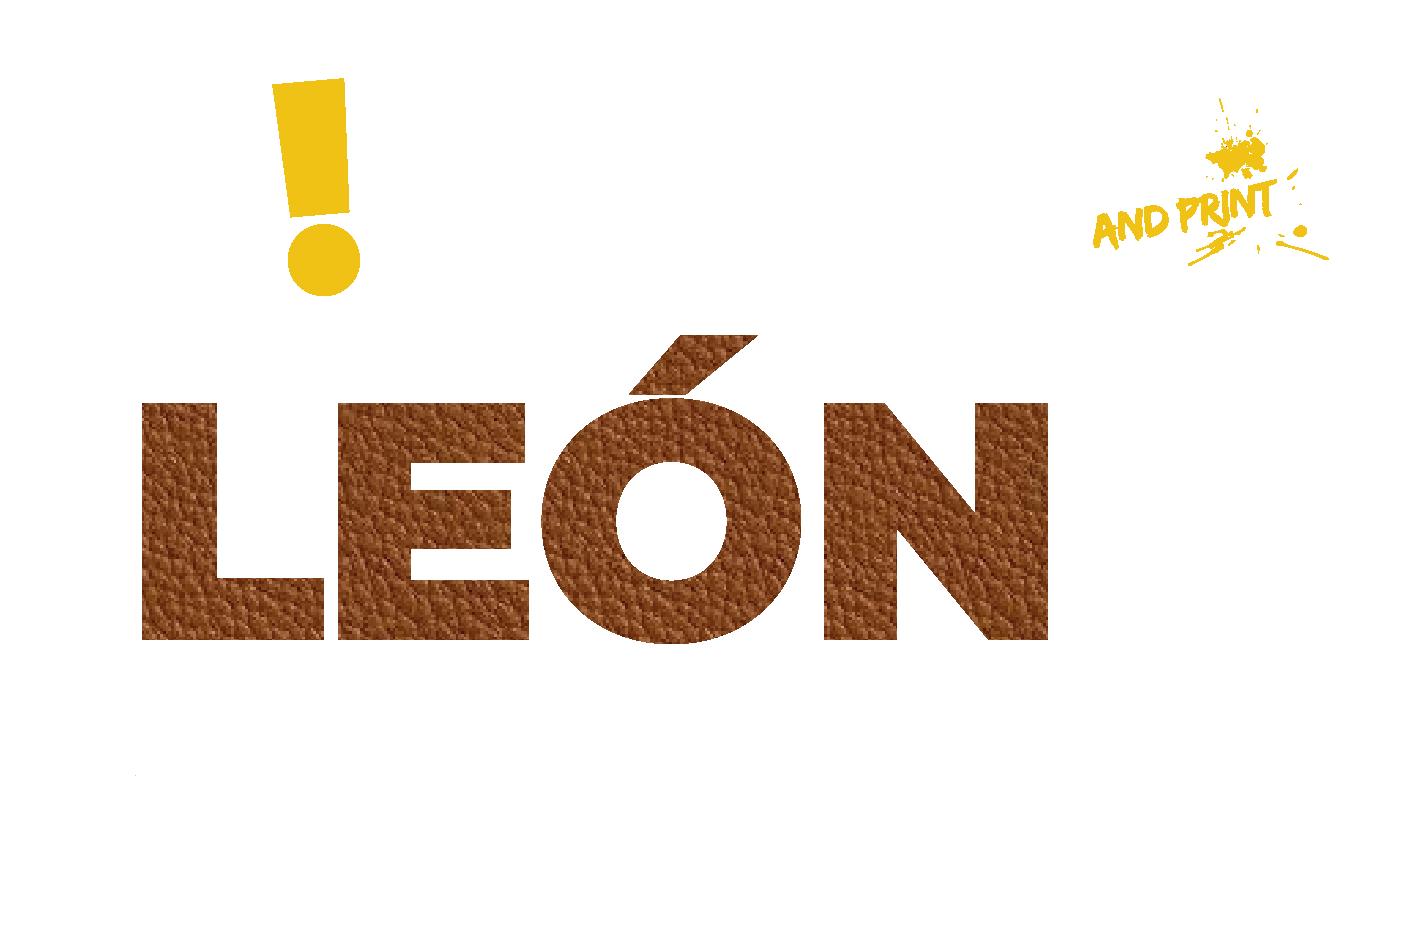 expo cdmx